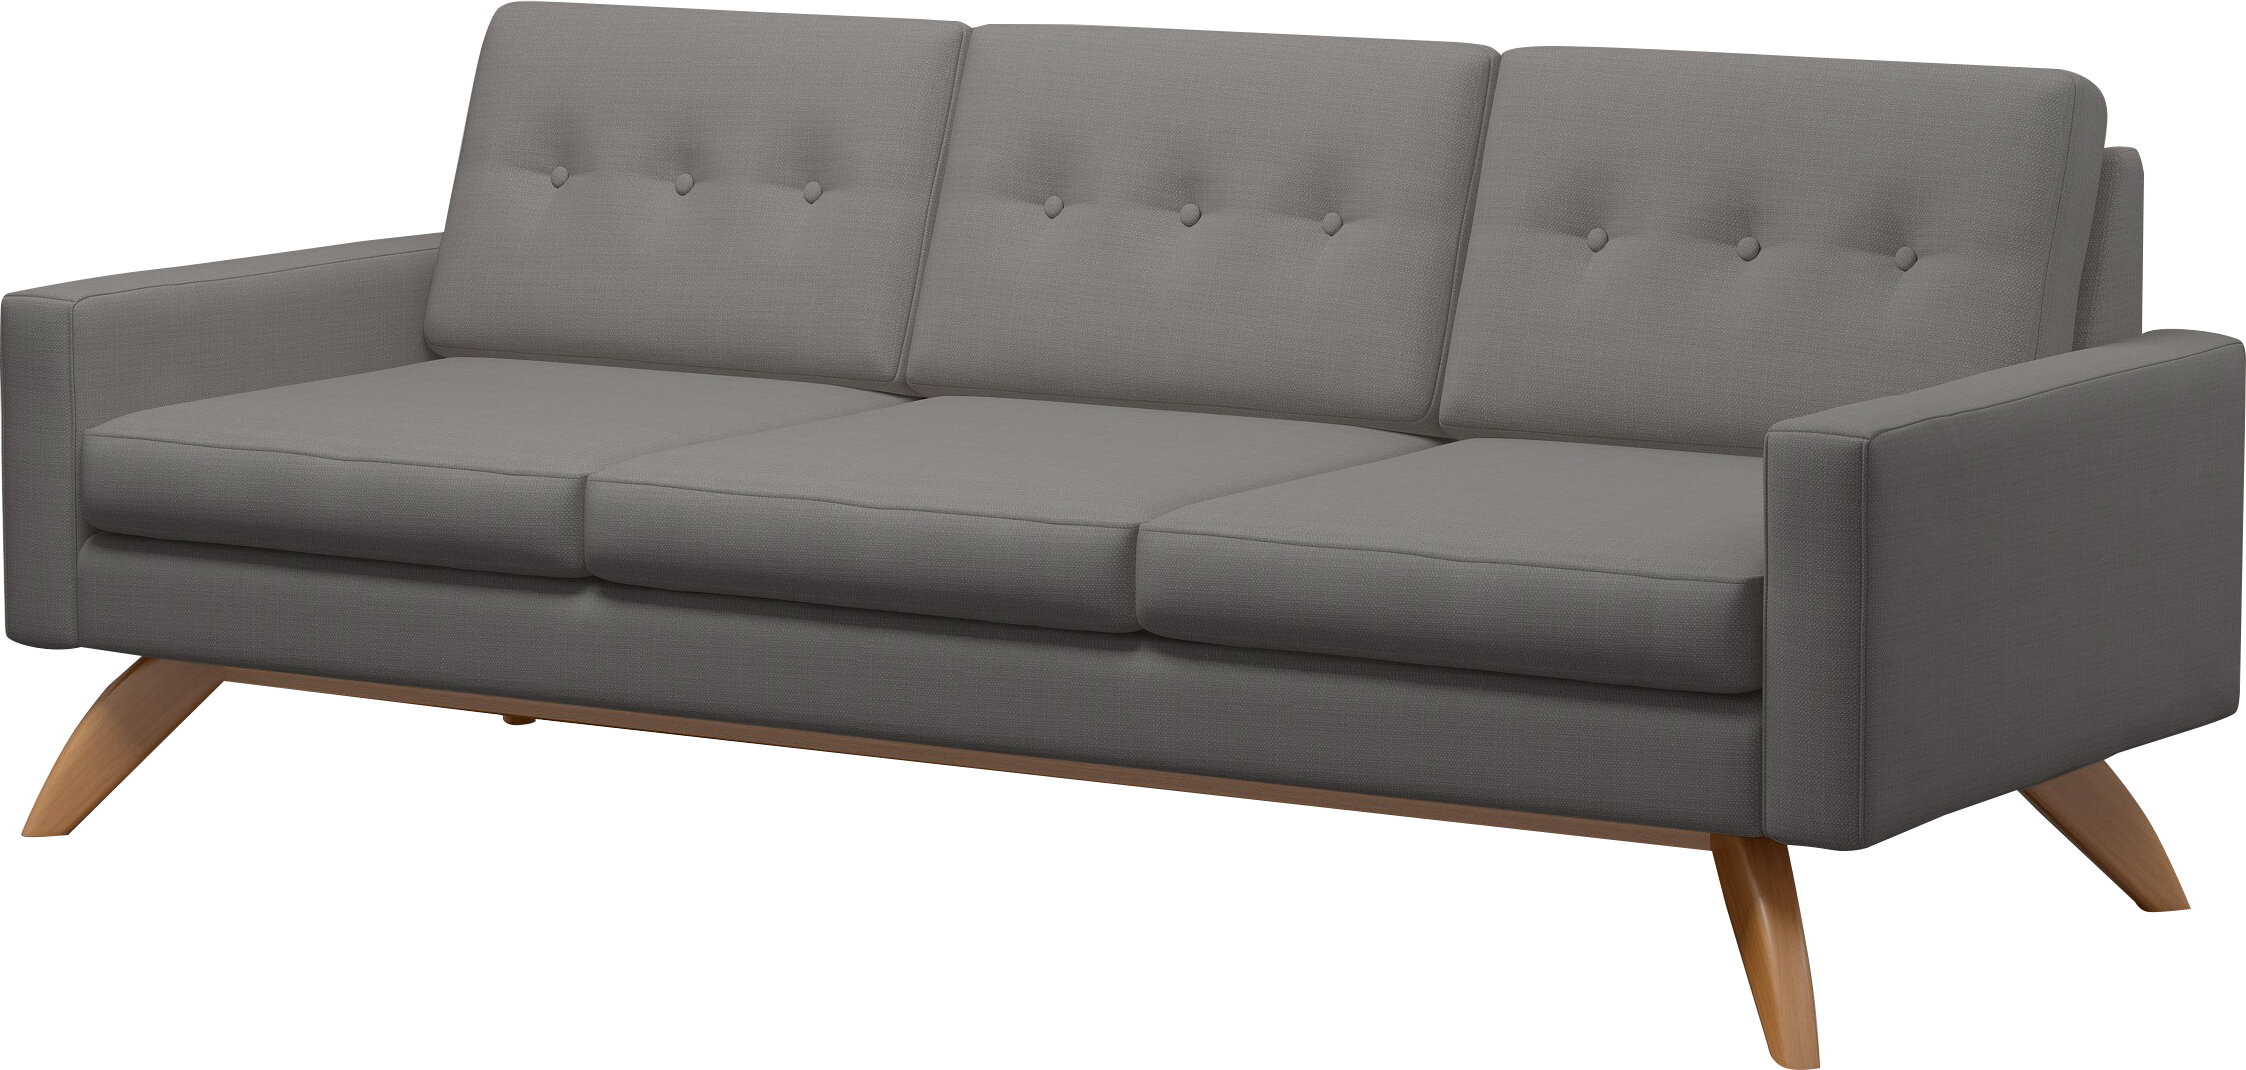 Luna 90 sofa reviews allmodern